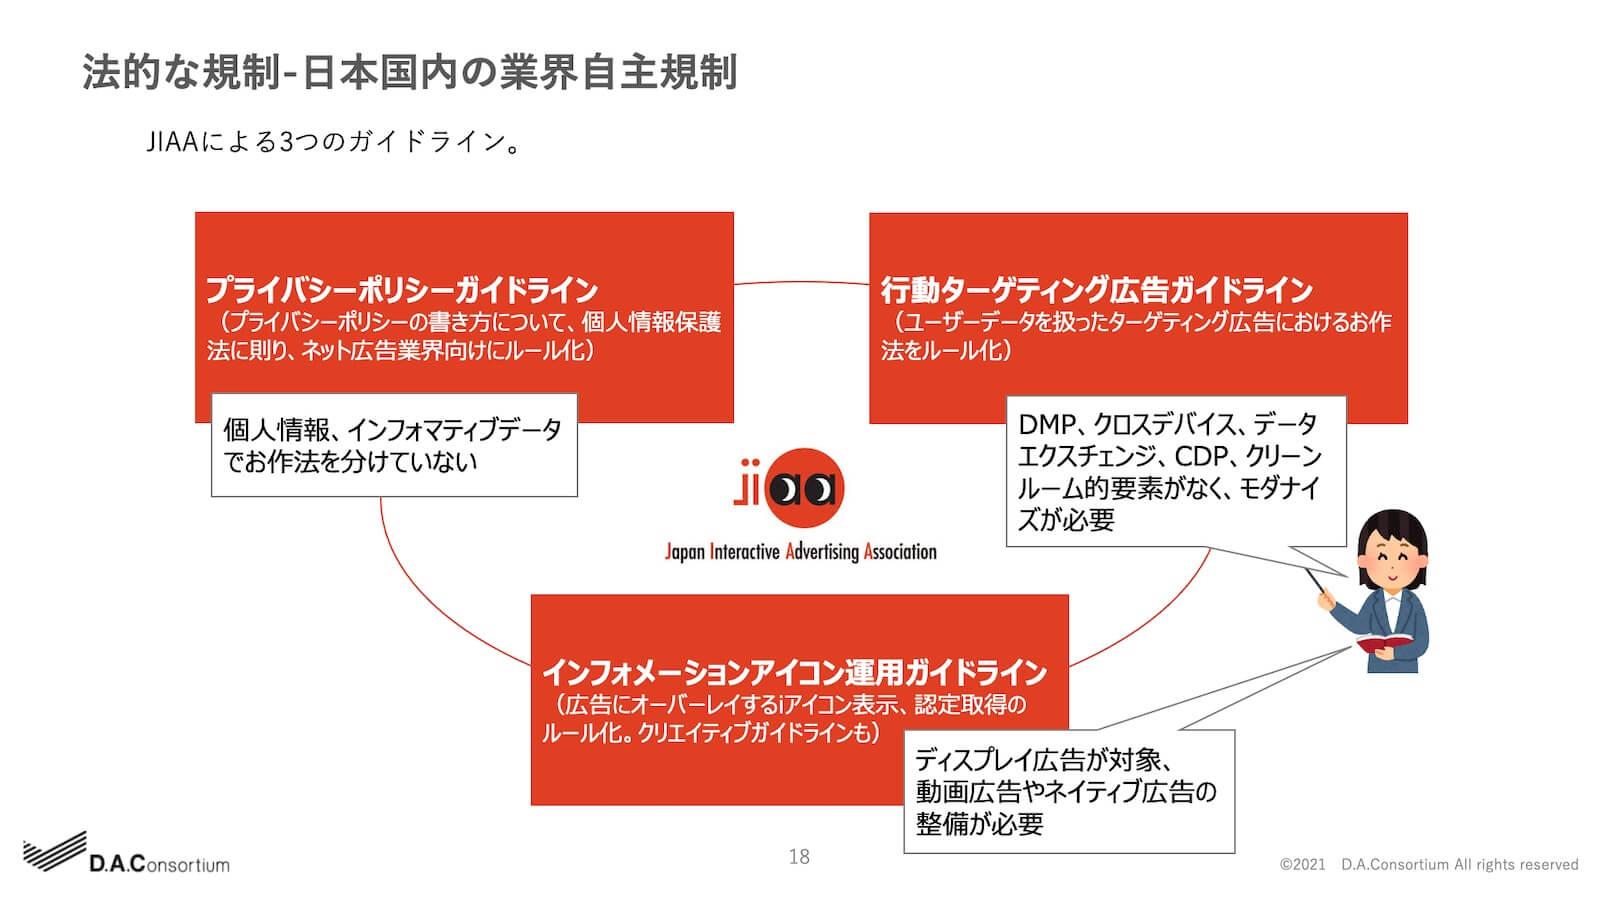 法的な規制-日本国内の業界自主規制